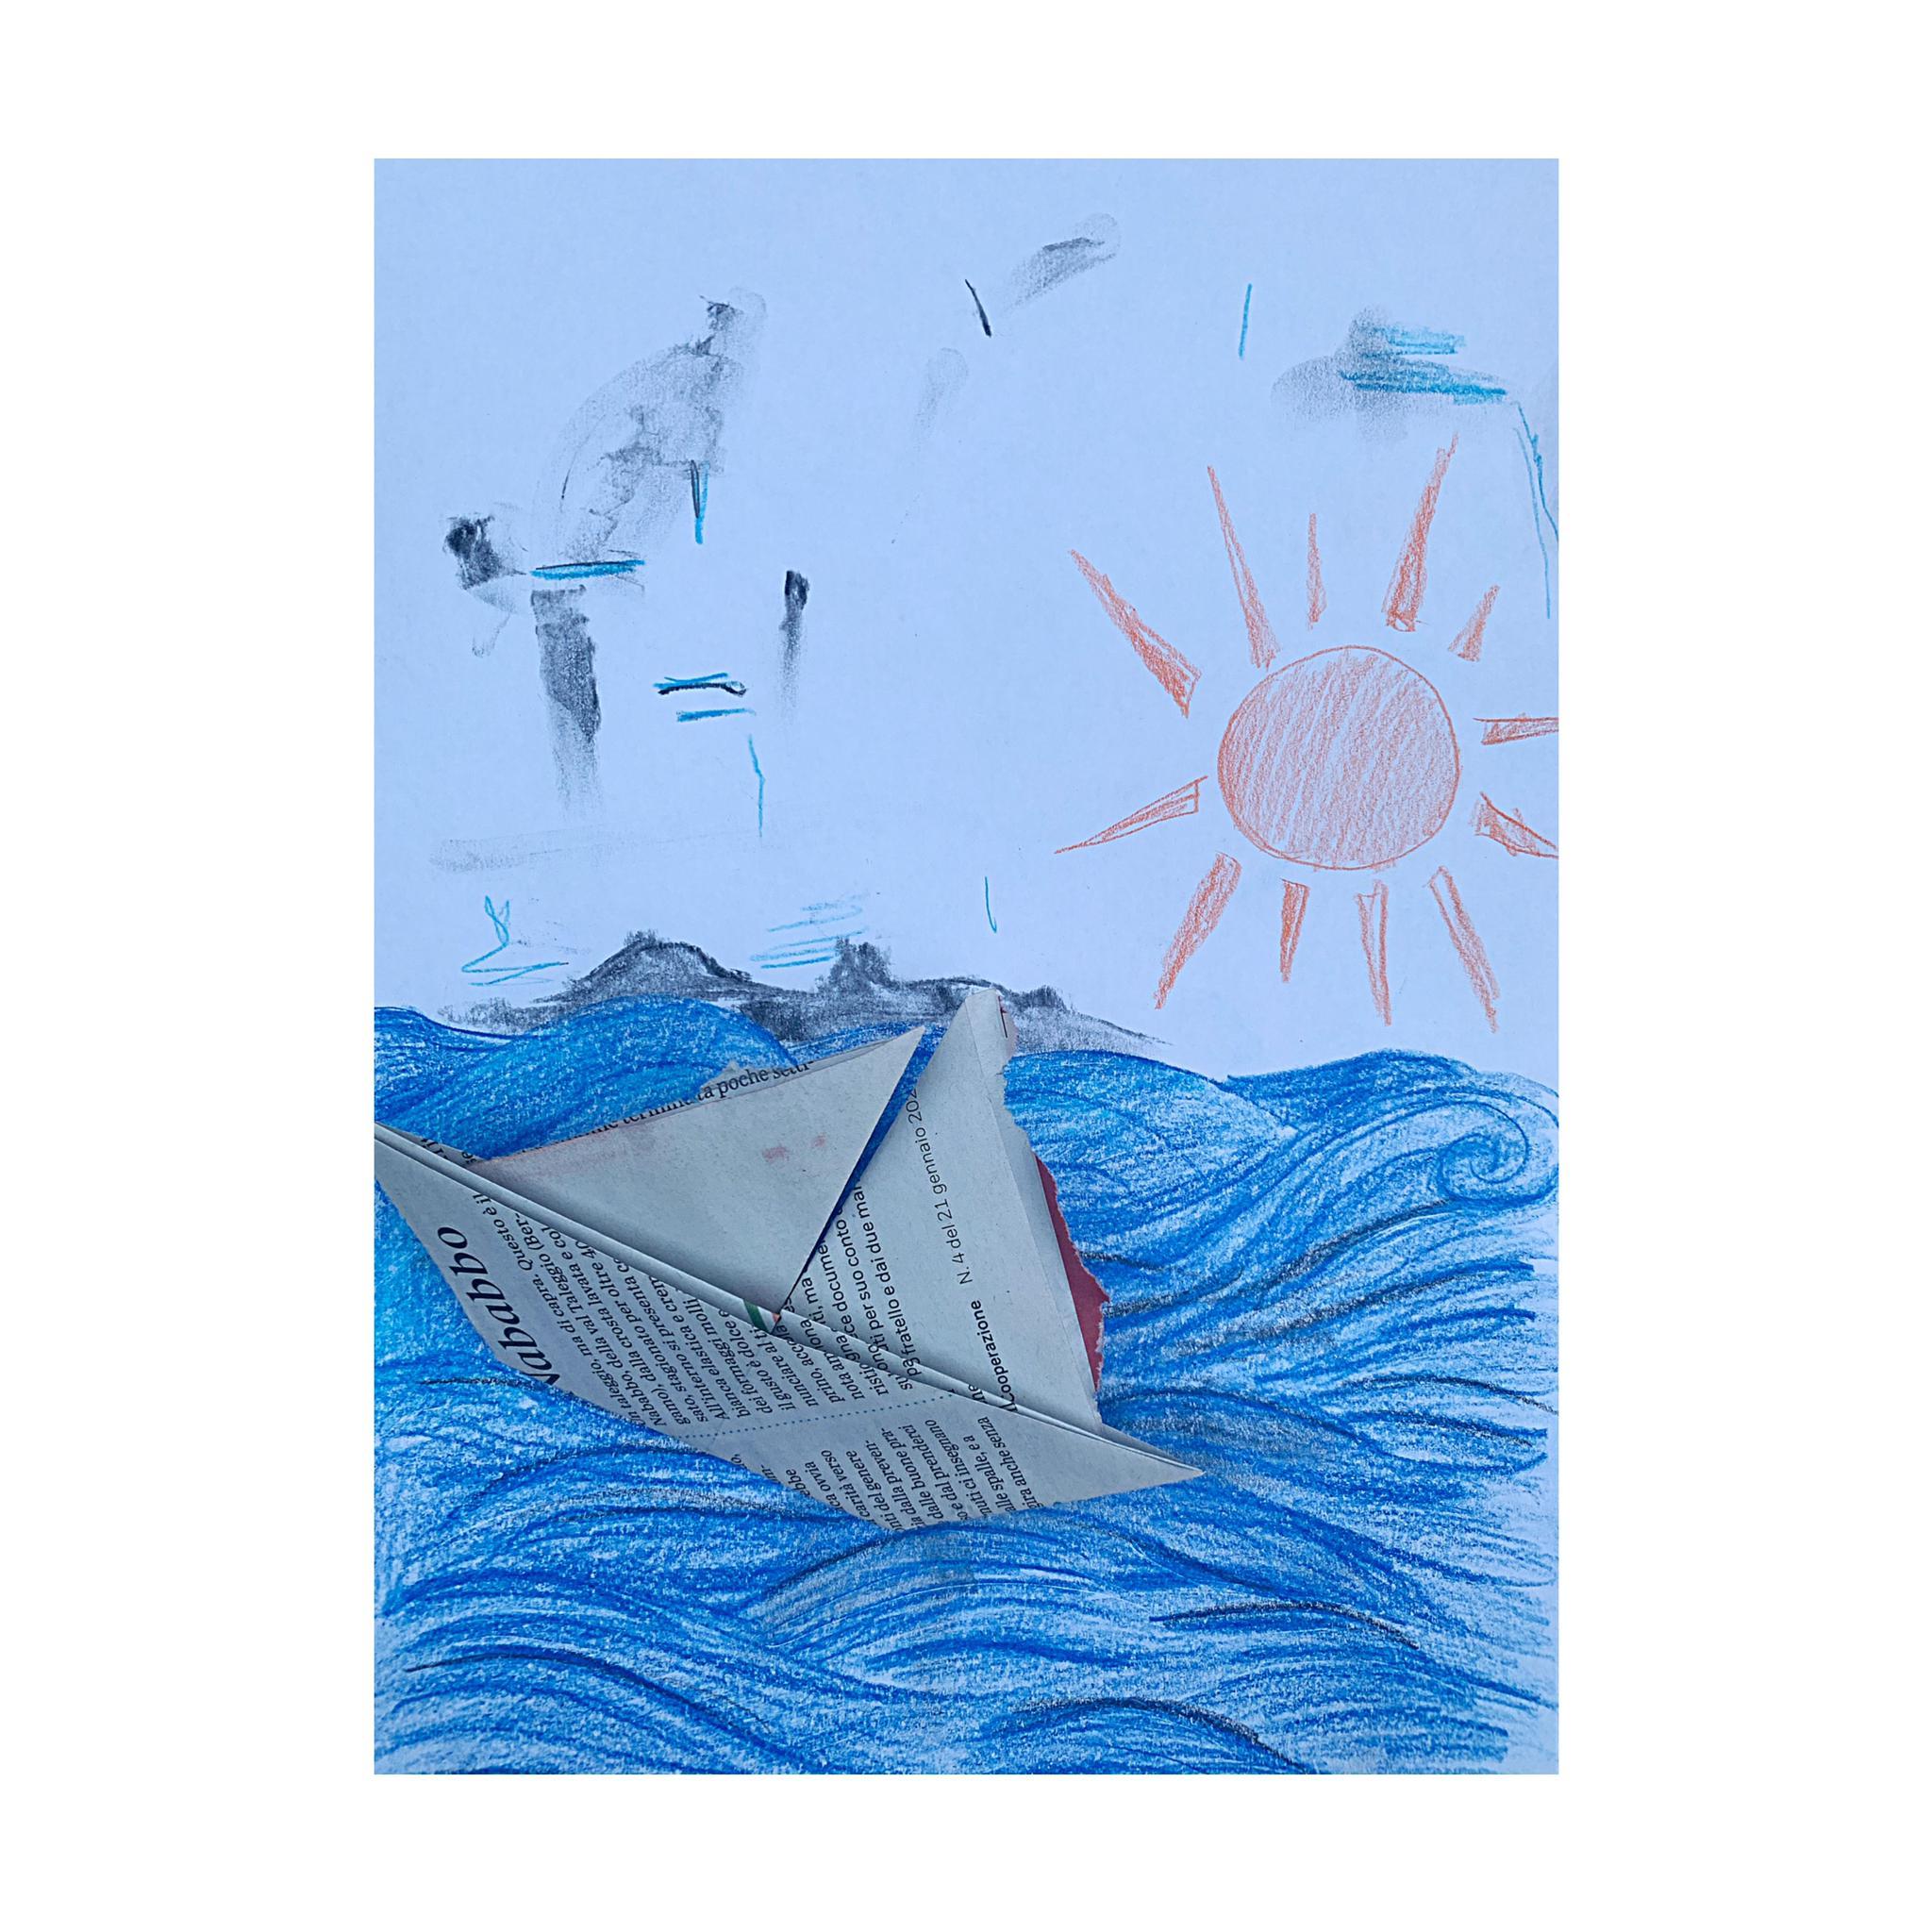 Flavio Calaon Grounding on a Boat